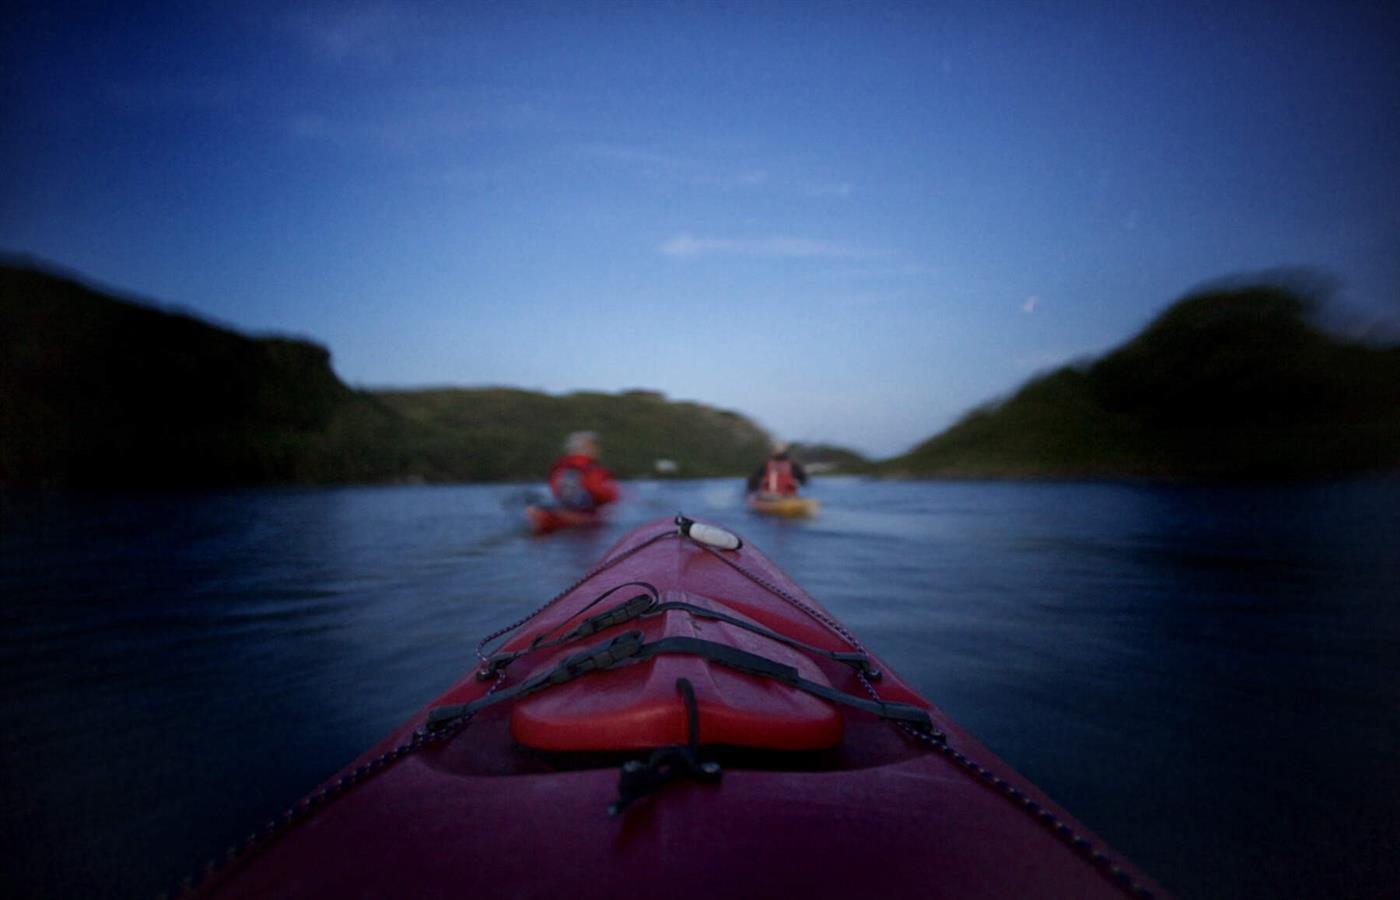 The Moonlight Starlight Kayaking Experie